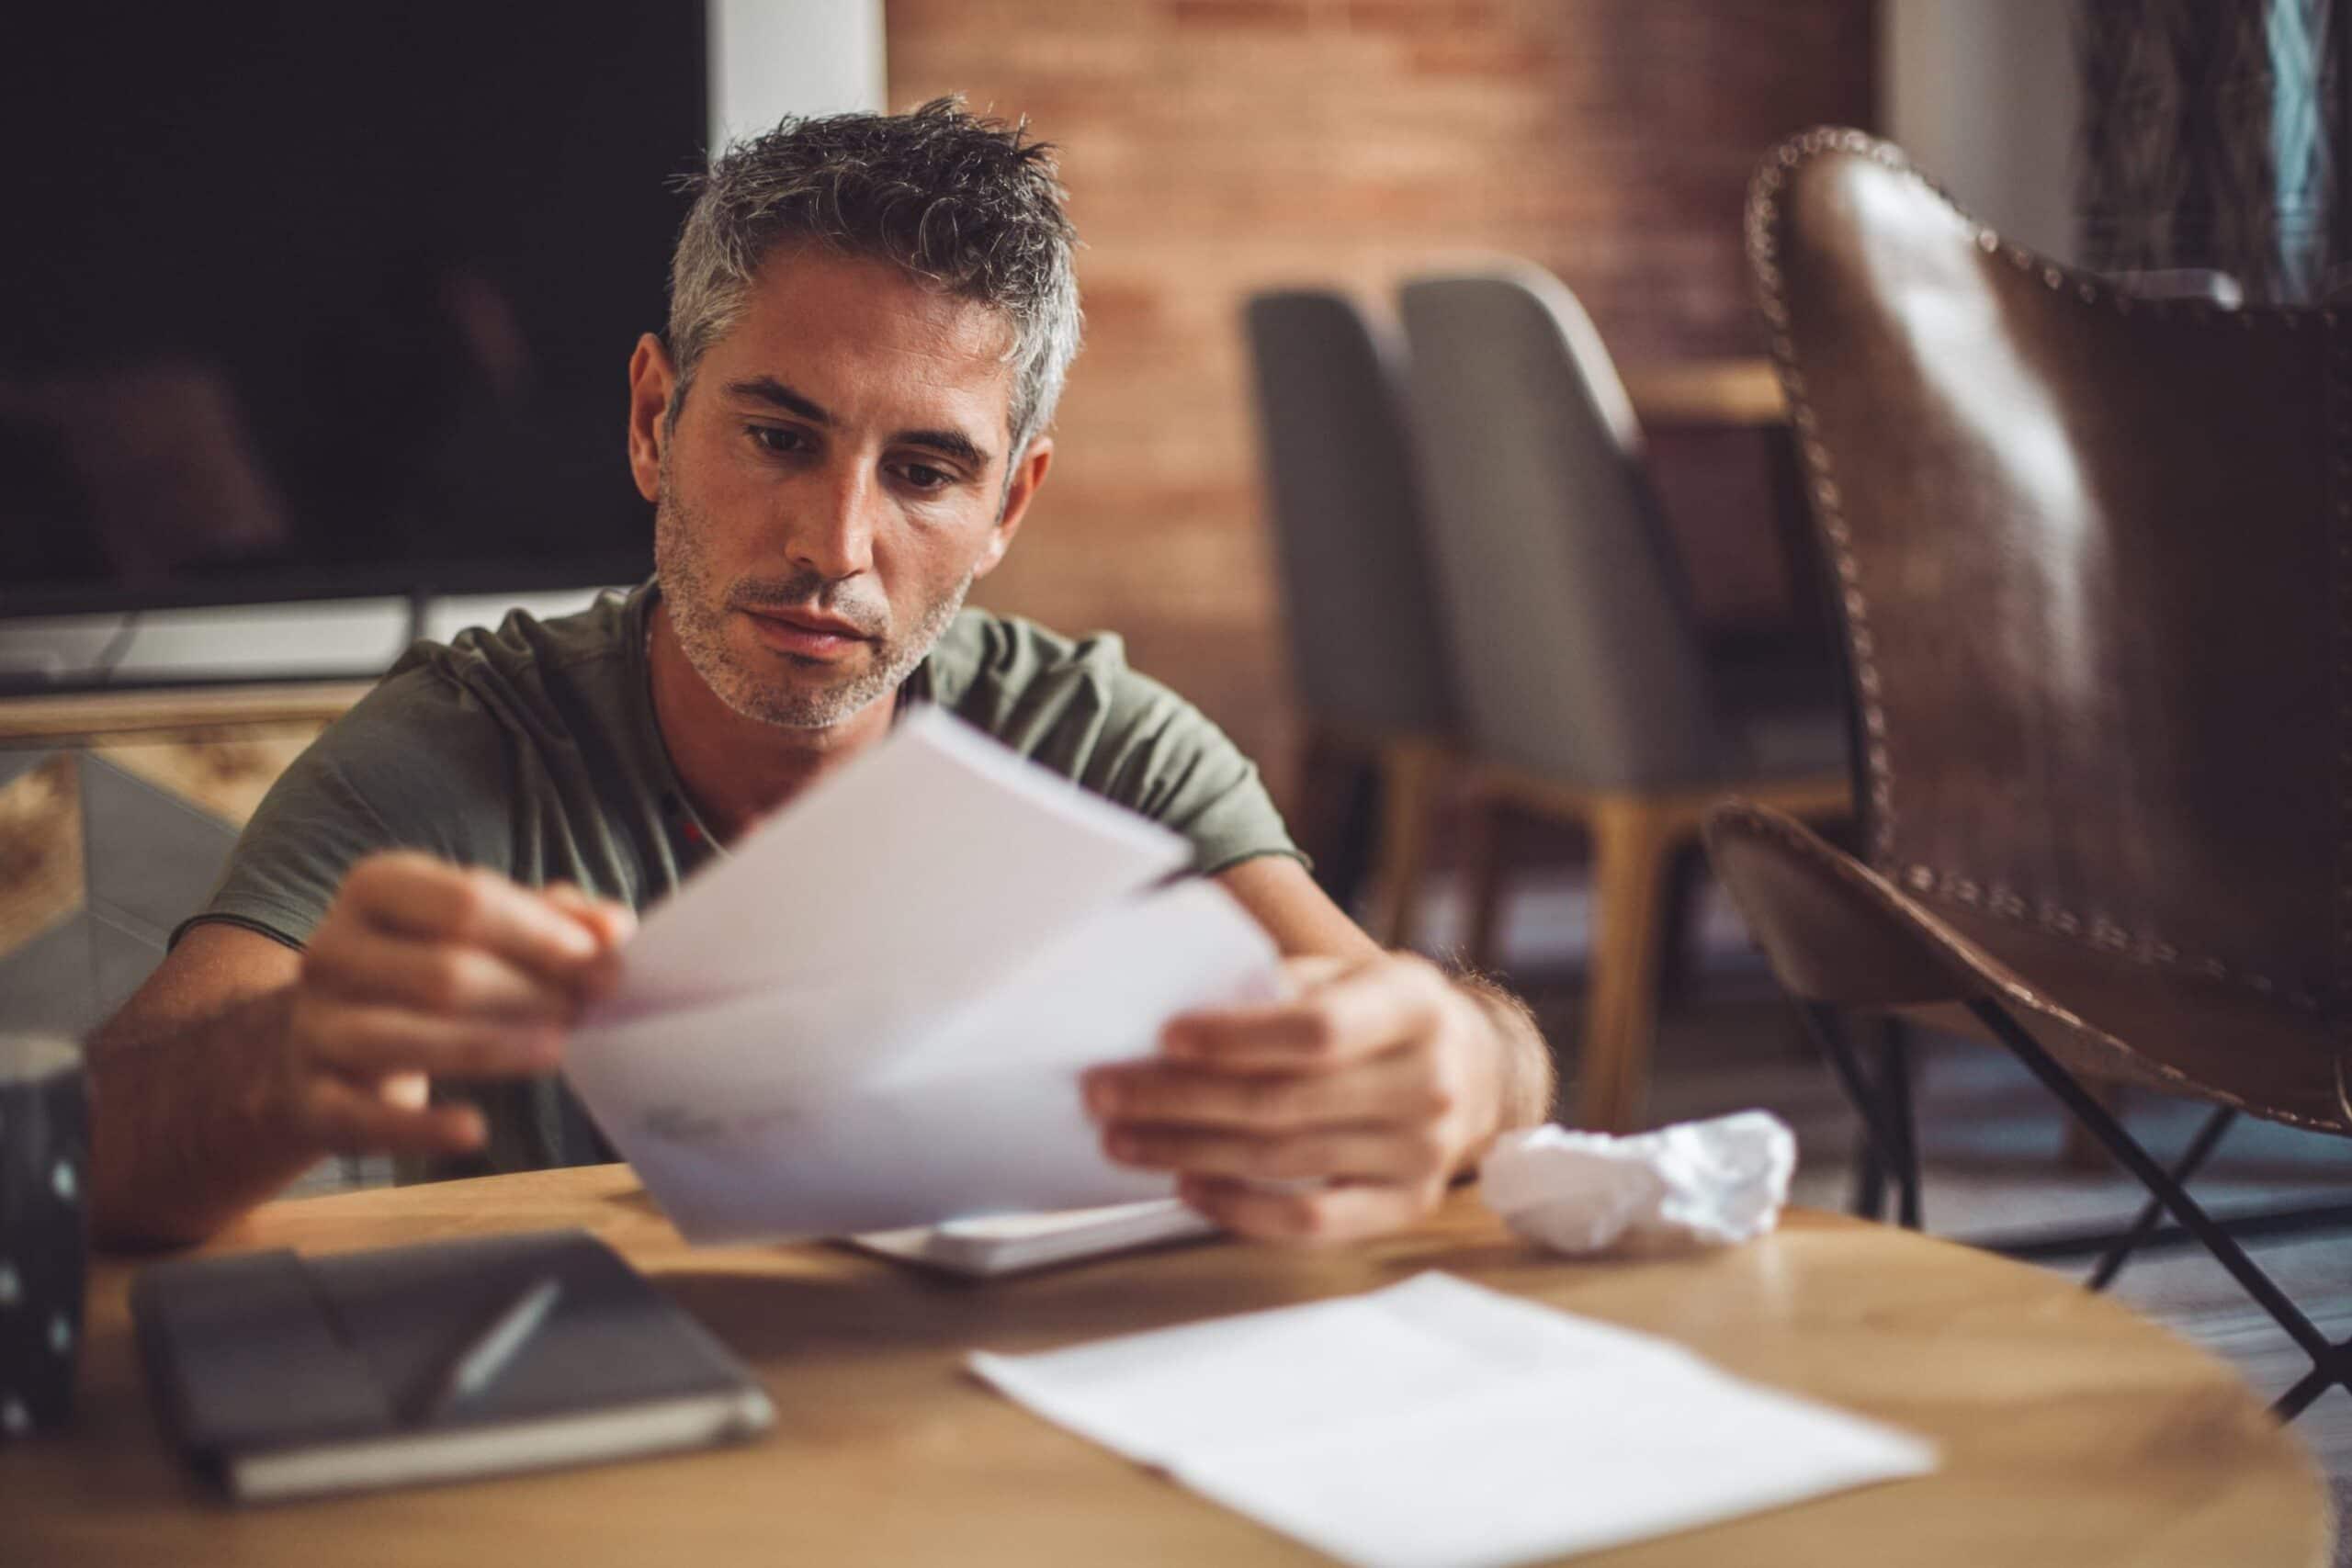 man looking through bills scaled